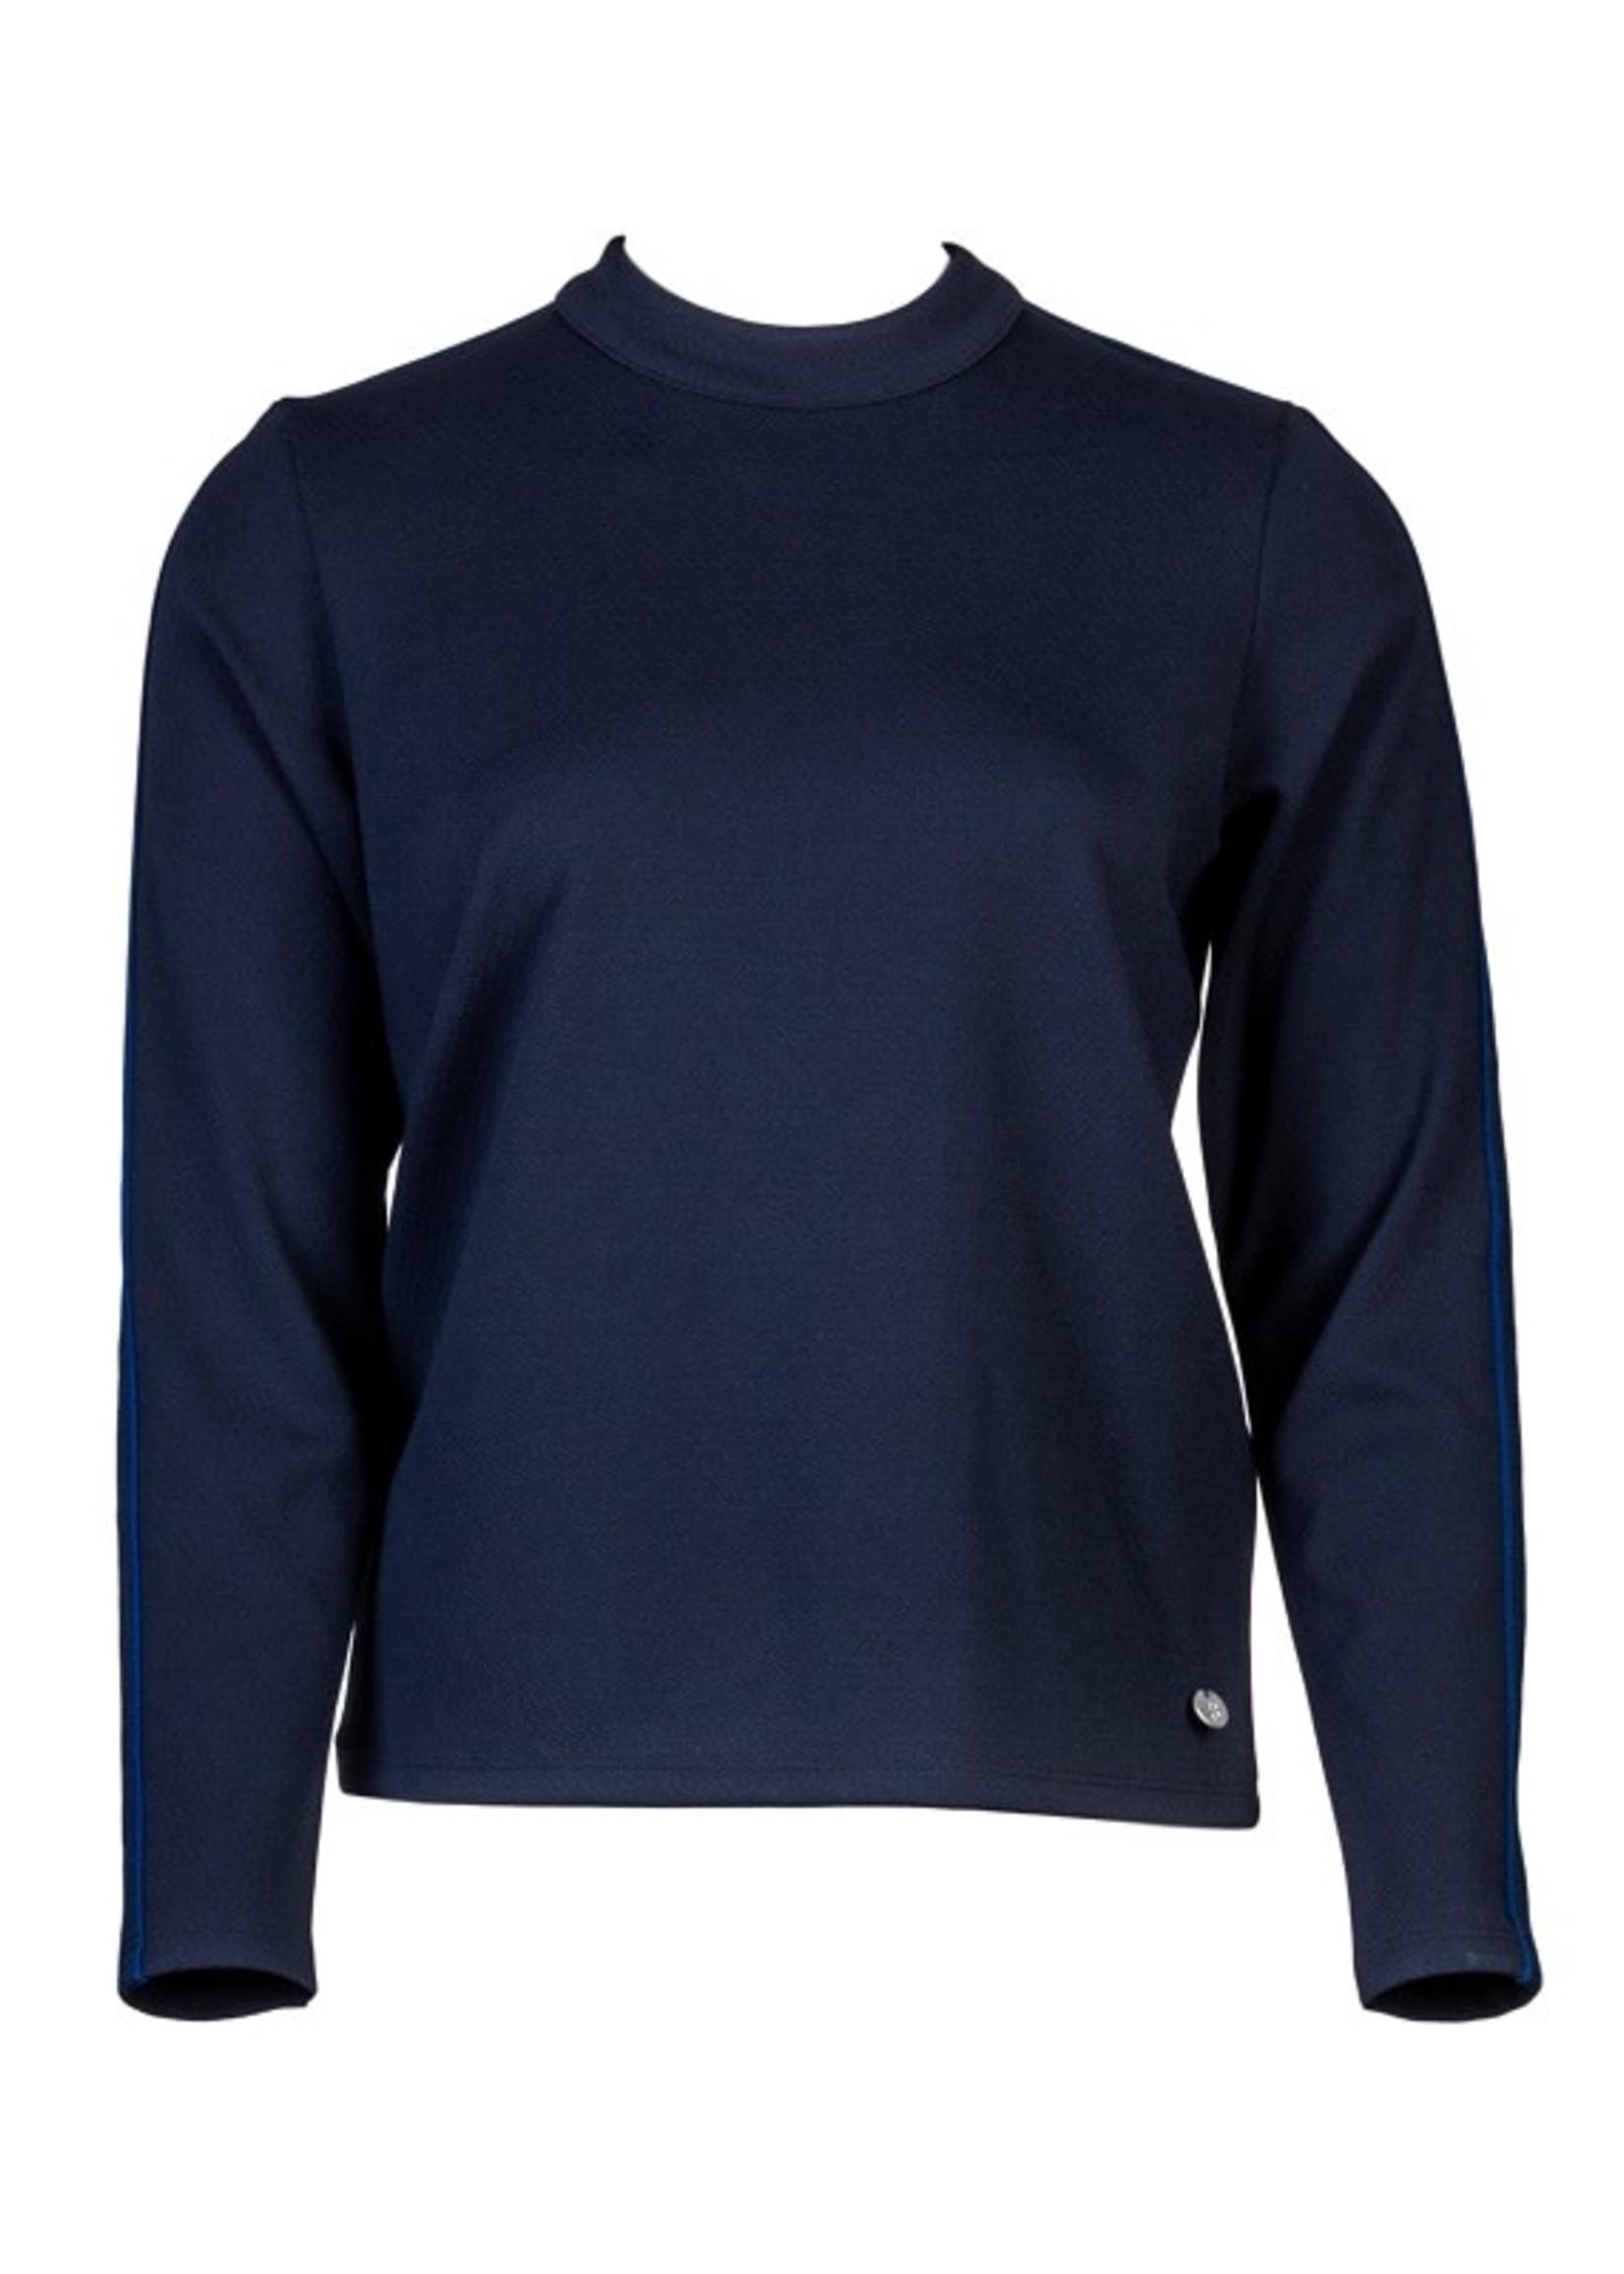 STAPELGOED Tonja navy shirt